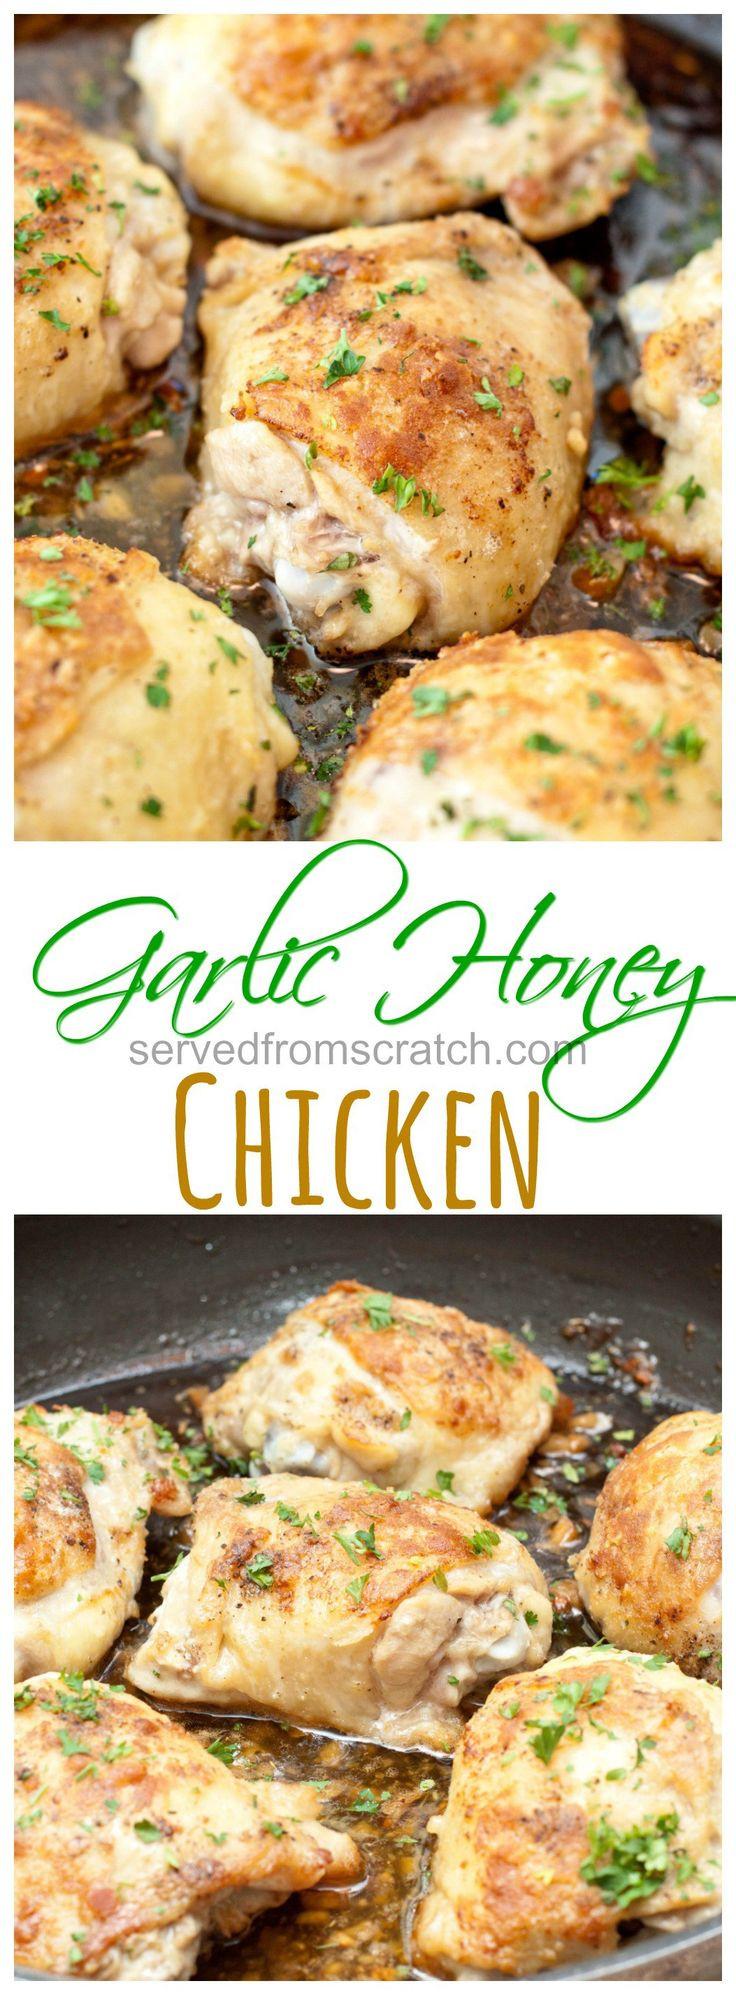 Diabetic Chicken Thigh Recipes  100 Diabetic Chicken Recipes on Pinterest